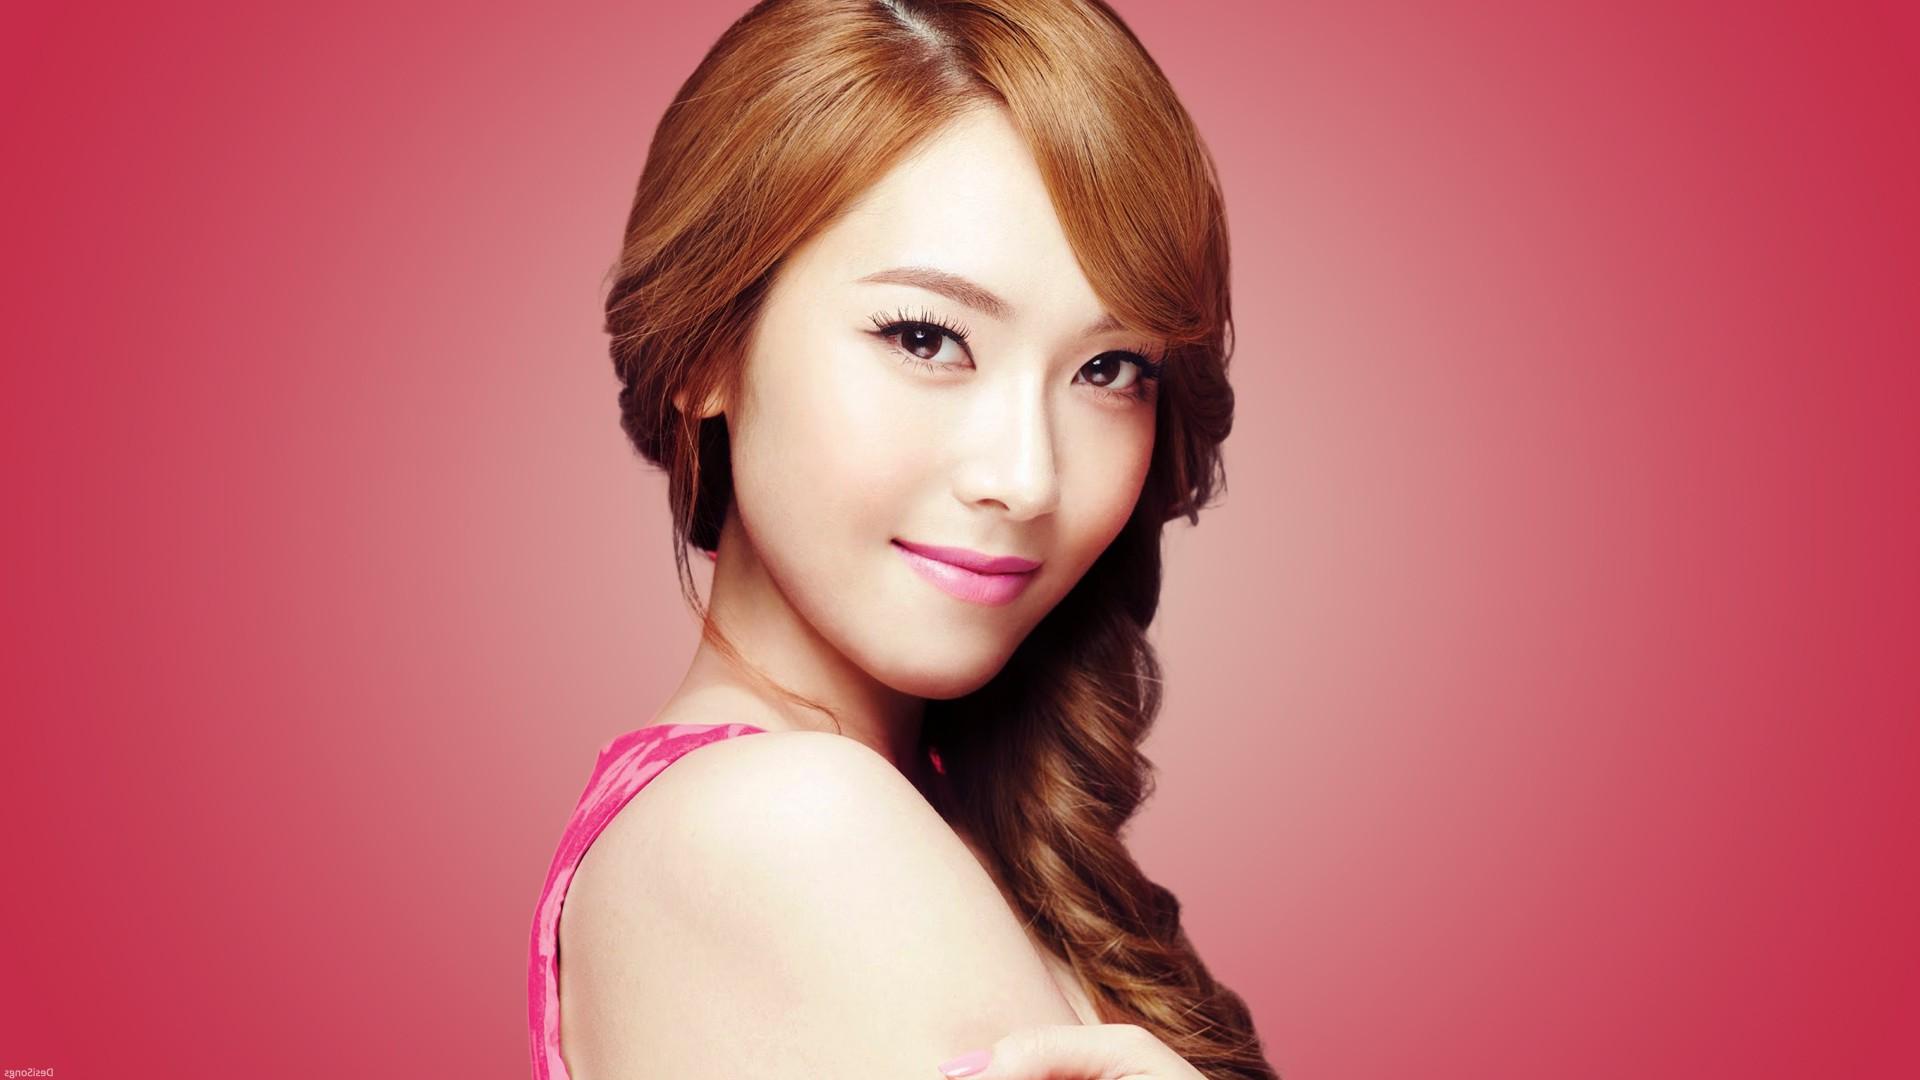 Snsd, Girls Generation, Asian, Model, Musicians, Singer, - Asian Nose Model , HD Wallpaper & Backgrounds